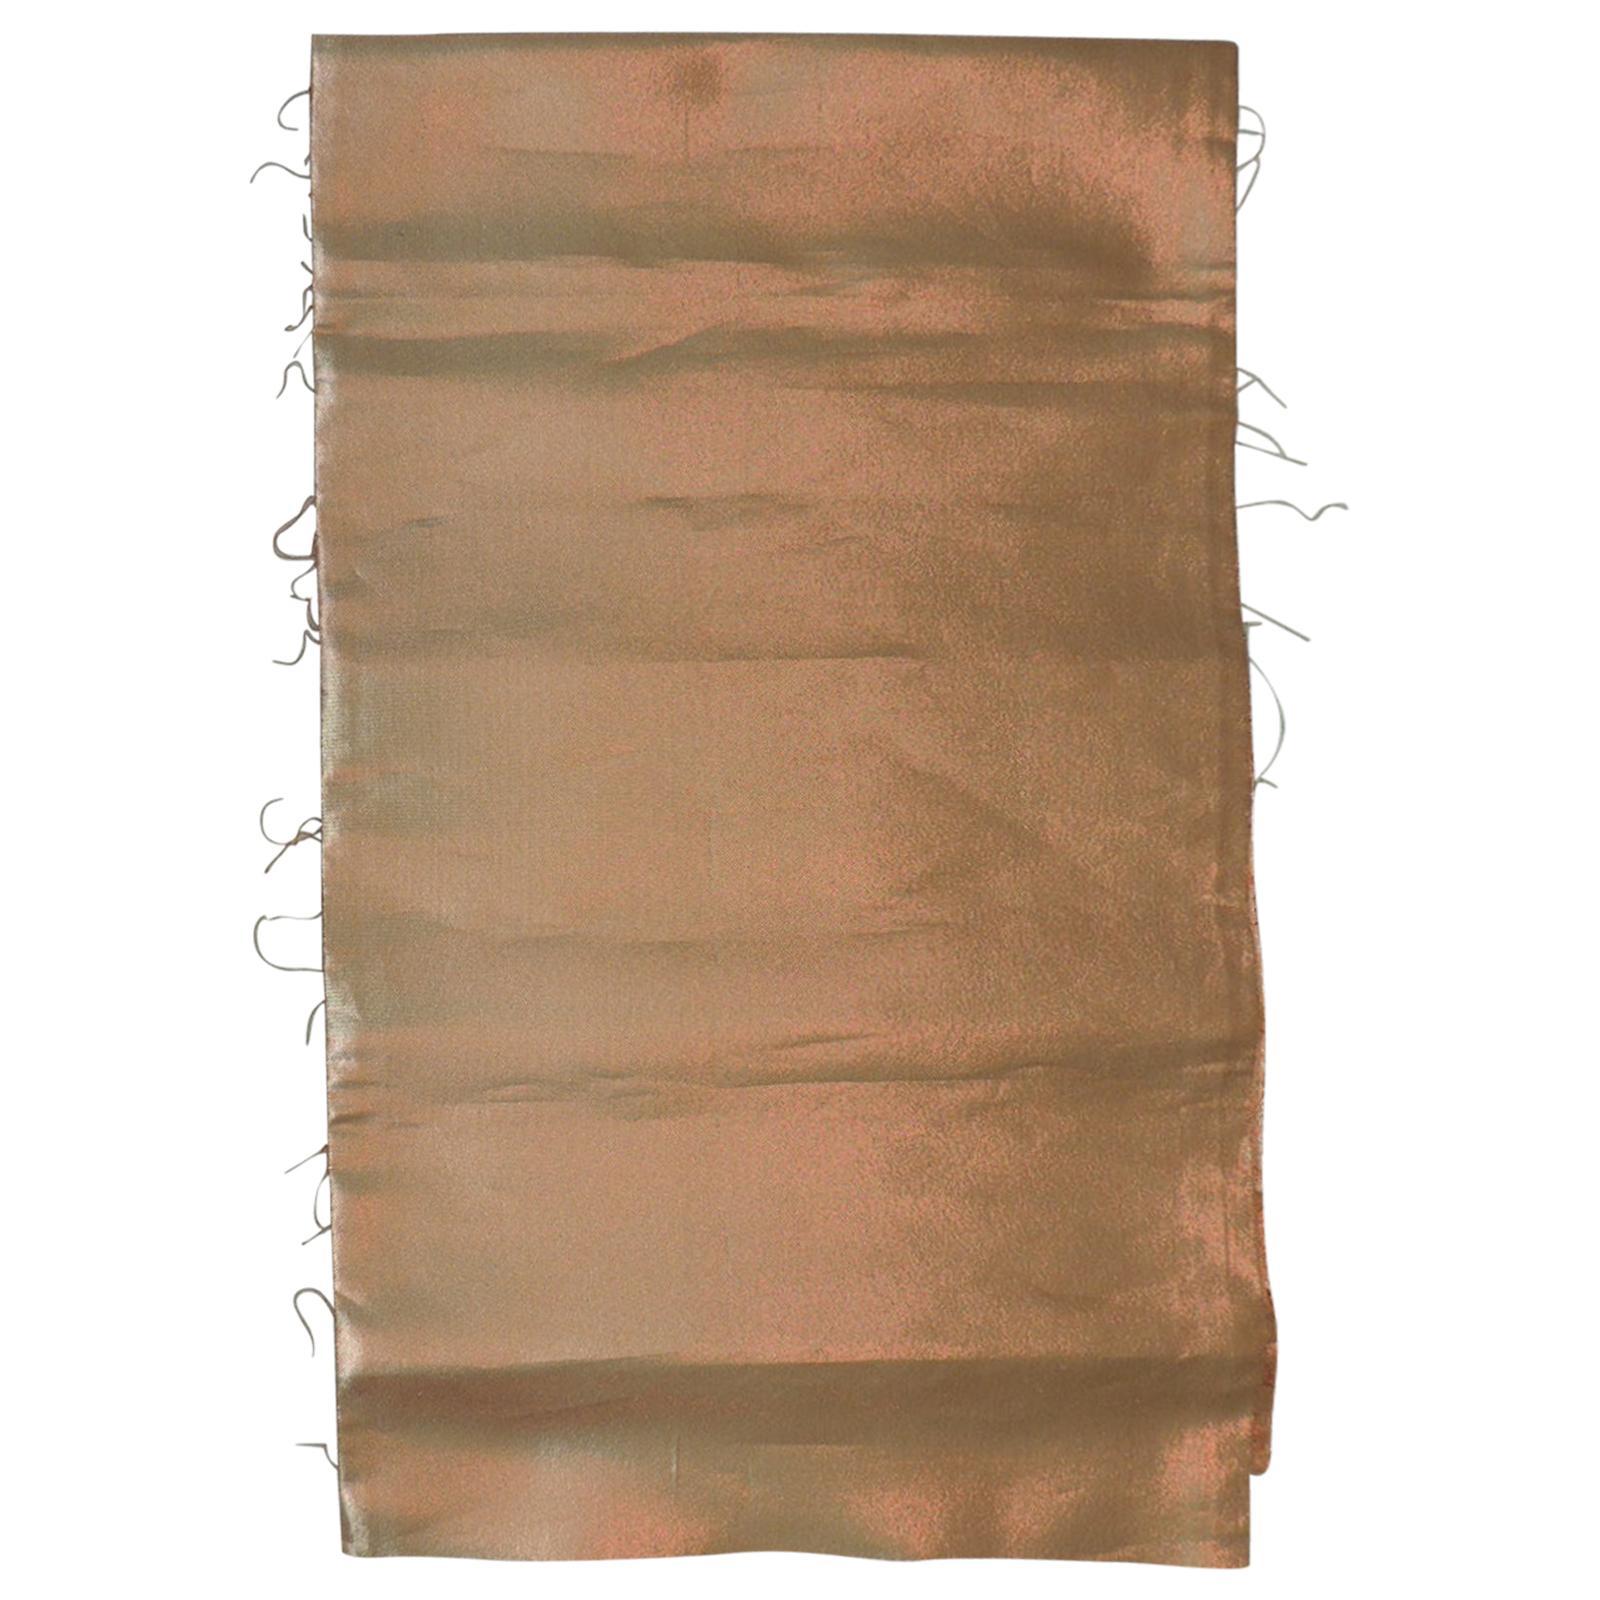 Burnt Orange Iridescent Silk Obi Solid Backing